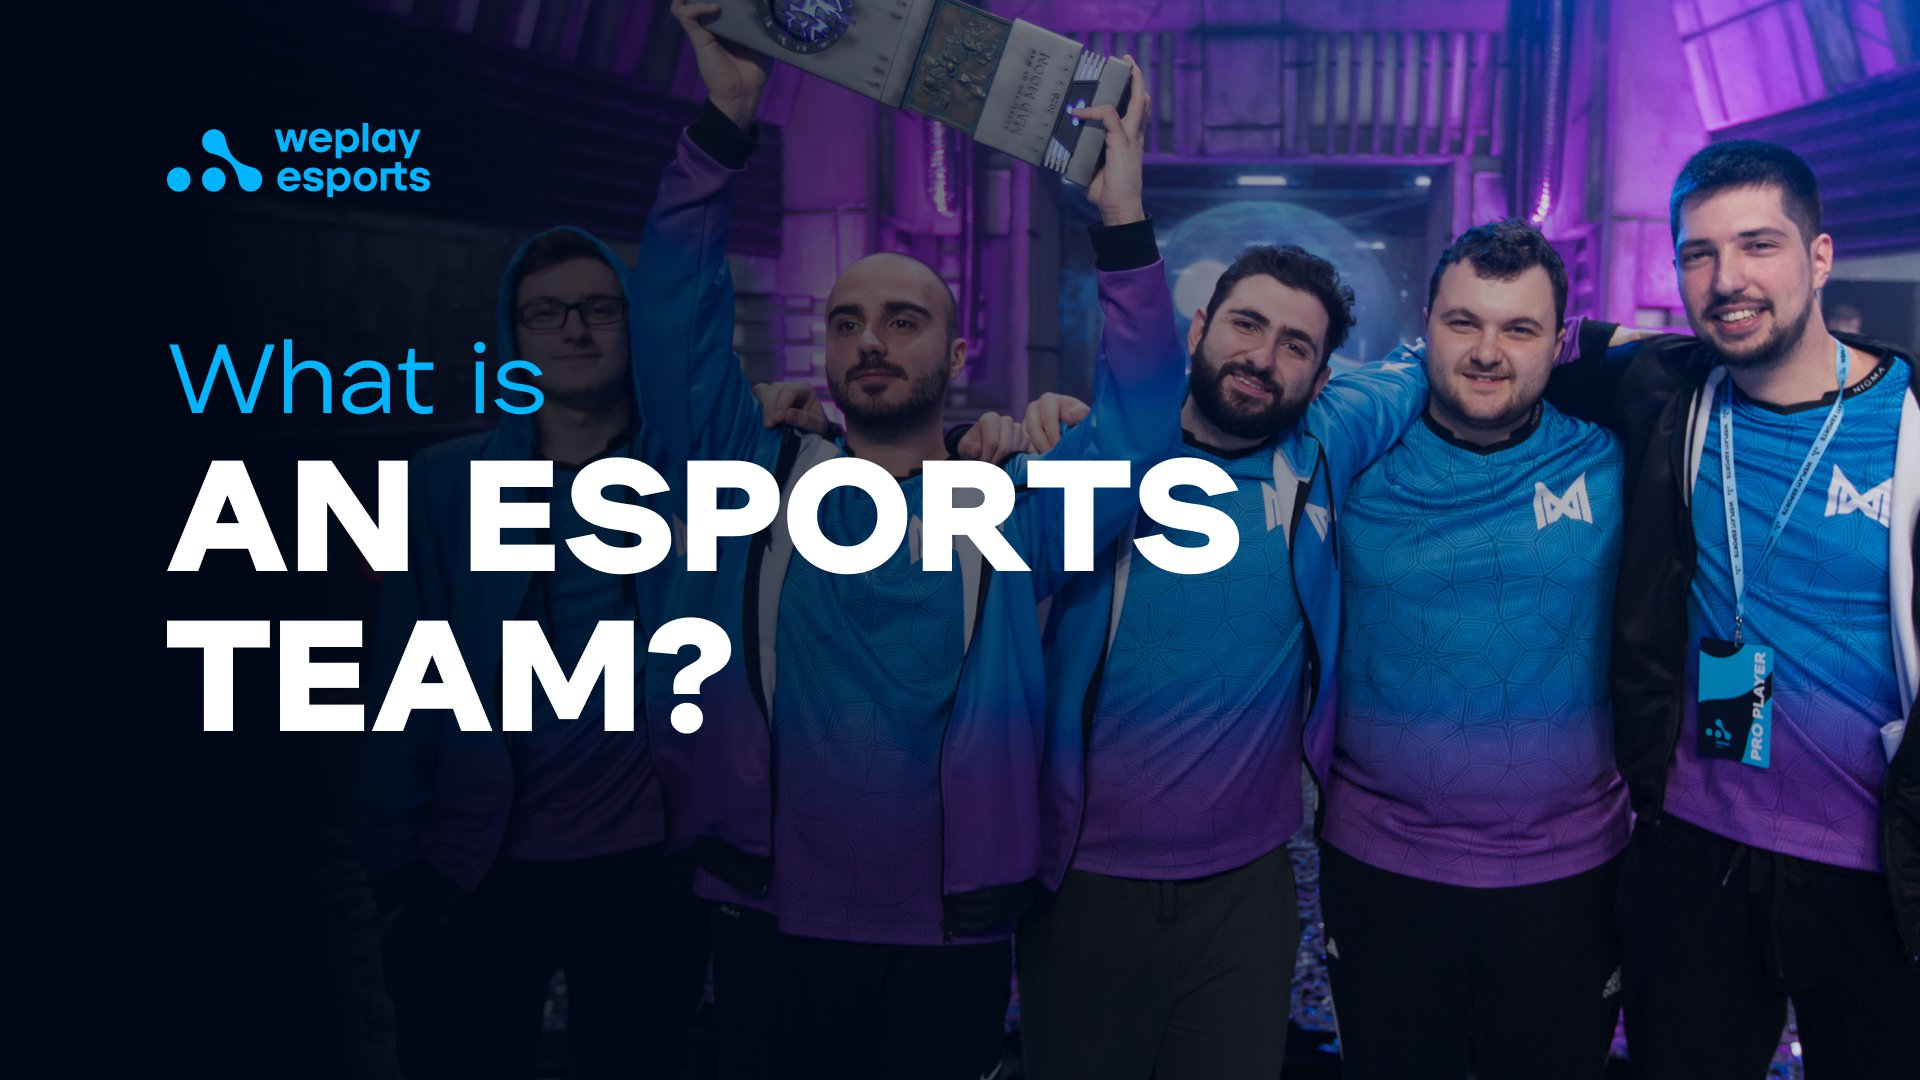 What is an esports team?